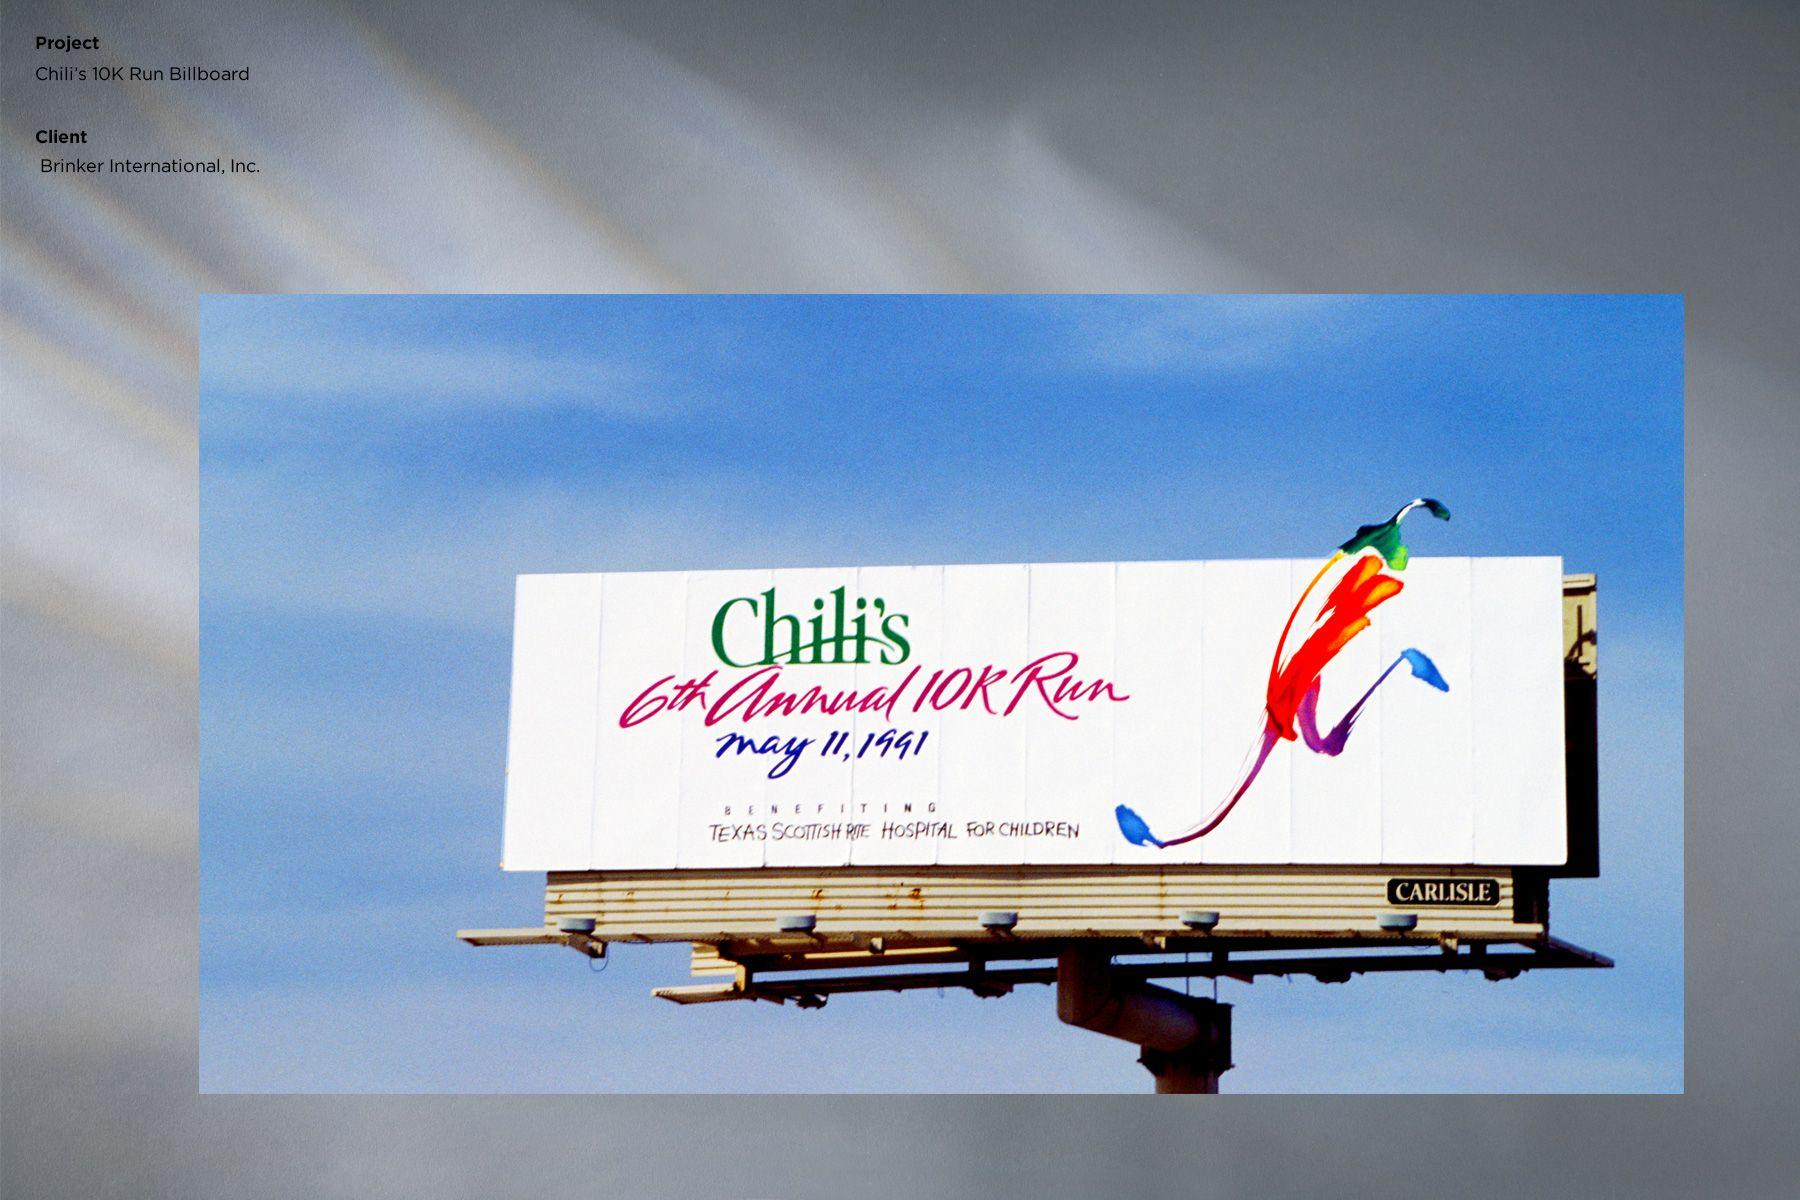 Chili's-Billboard_GryBkgrd.jpg